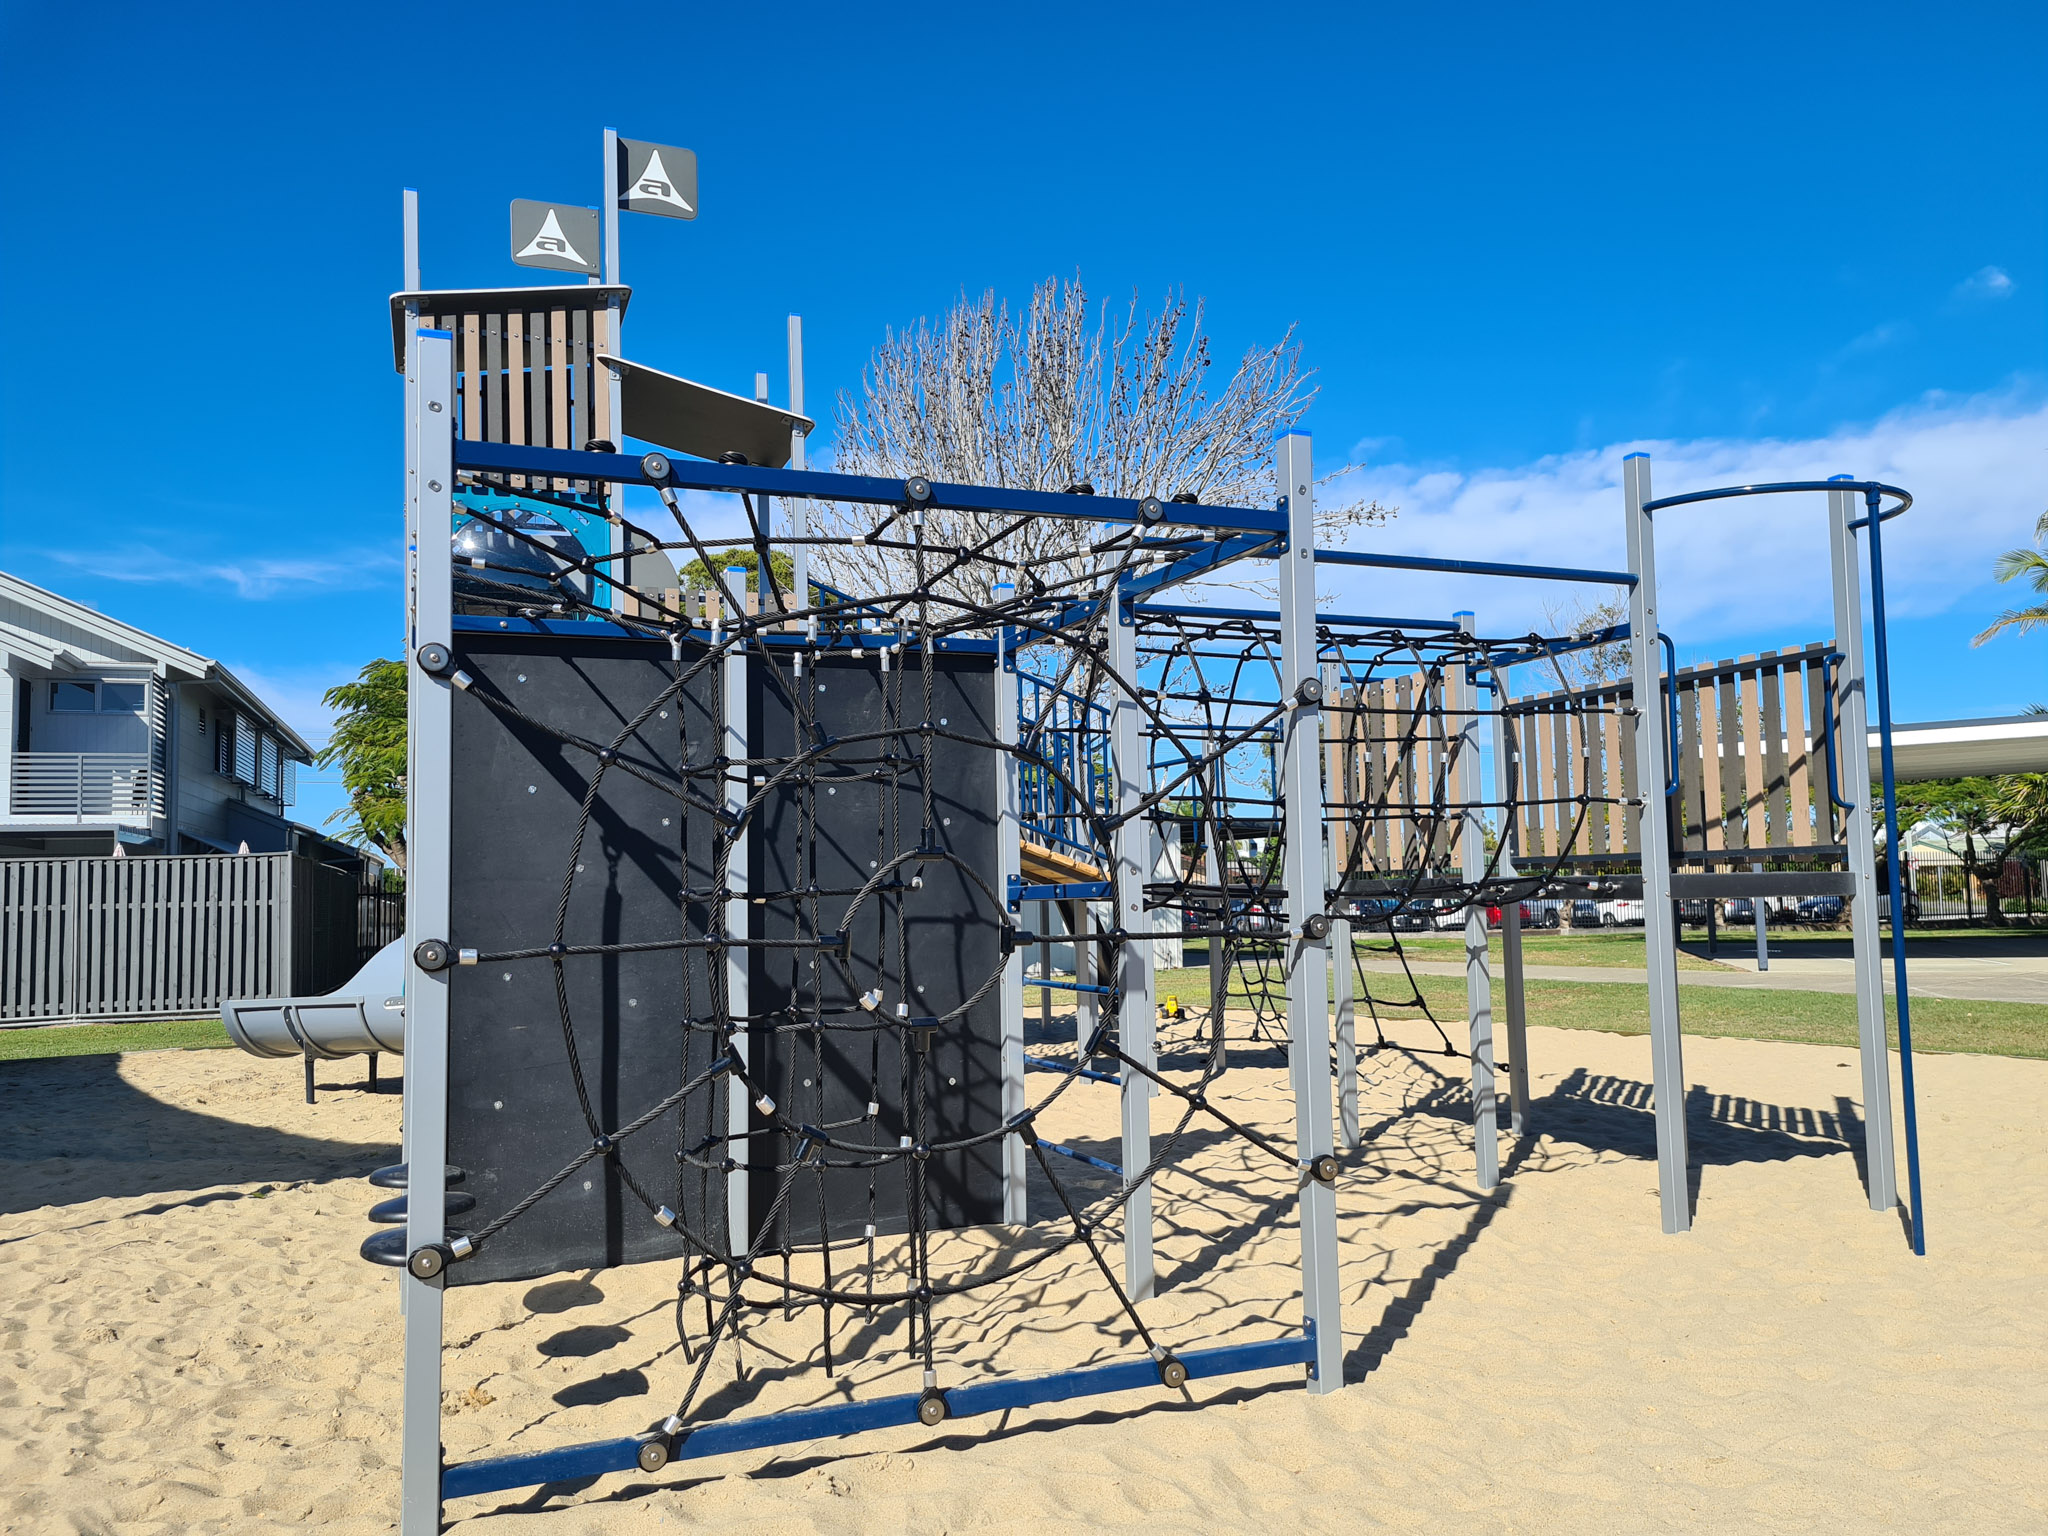 palm-beach-state-school-playrground-austek-play-03